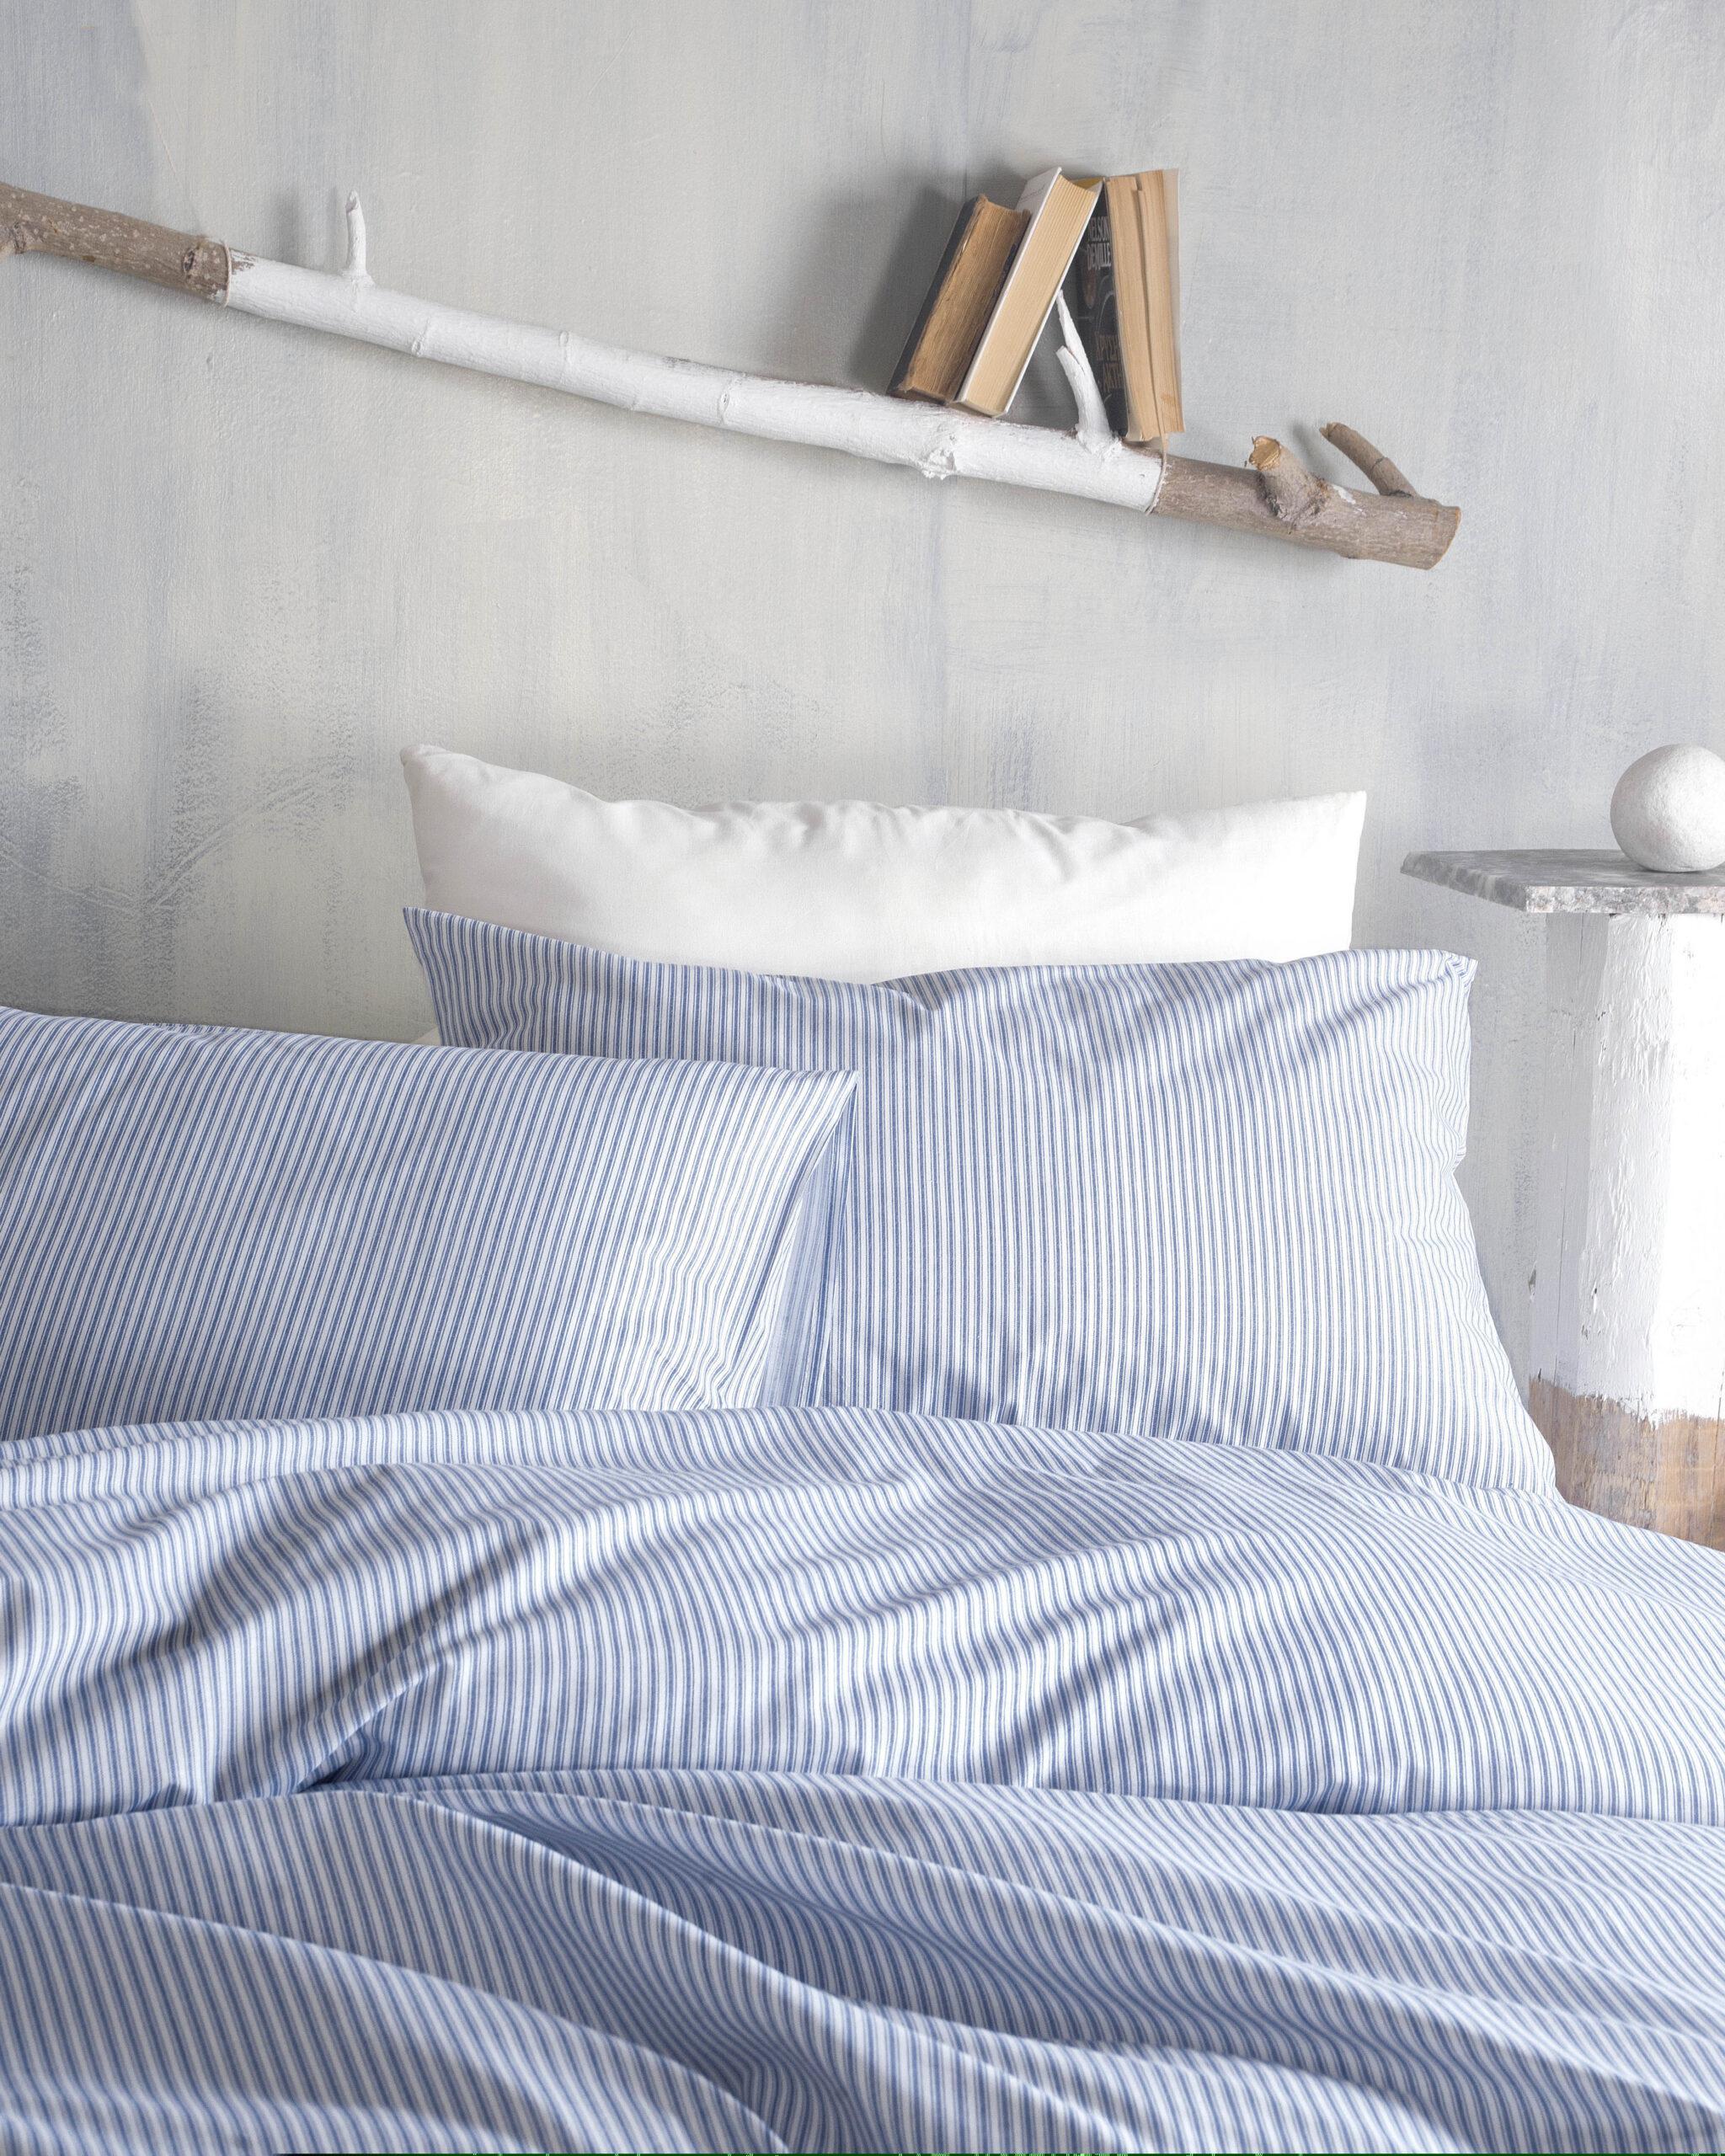 Rythmos Ιsandro Μπλε – Ζευγοσ Μαξιλαροθηκεσ 50Χ70